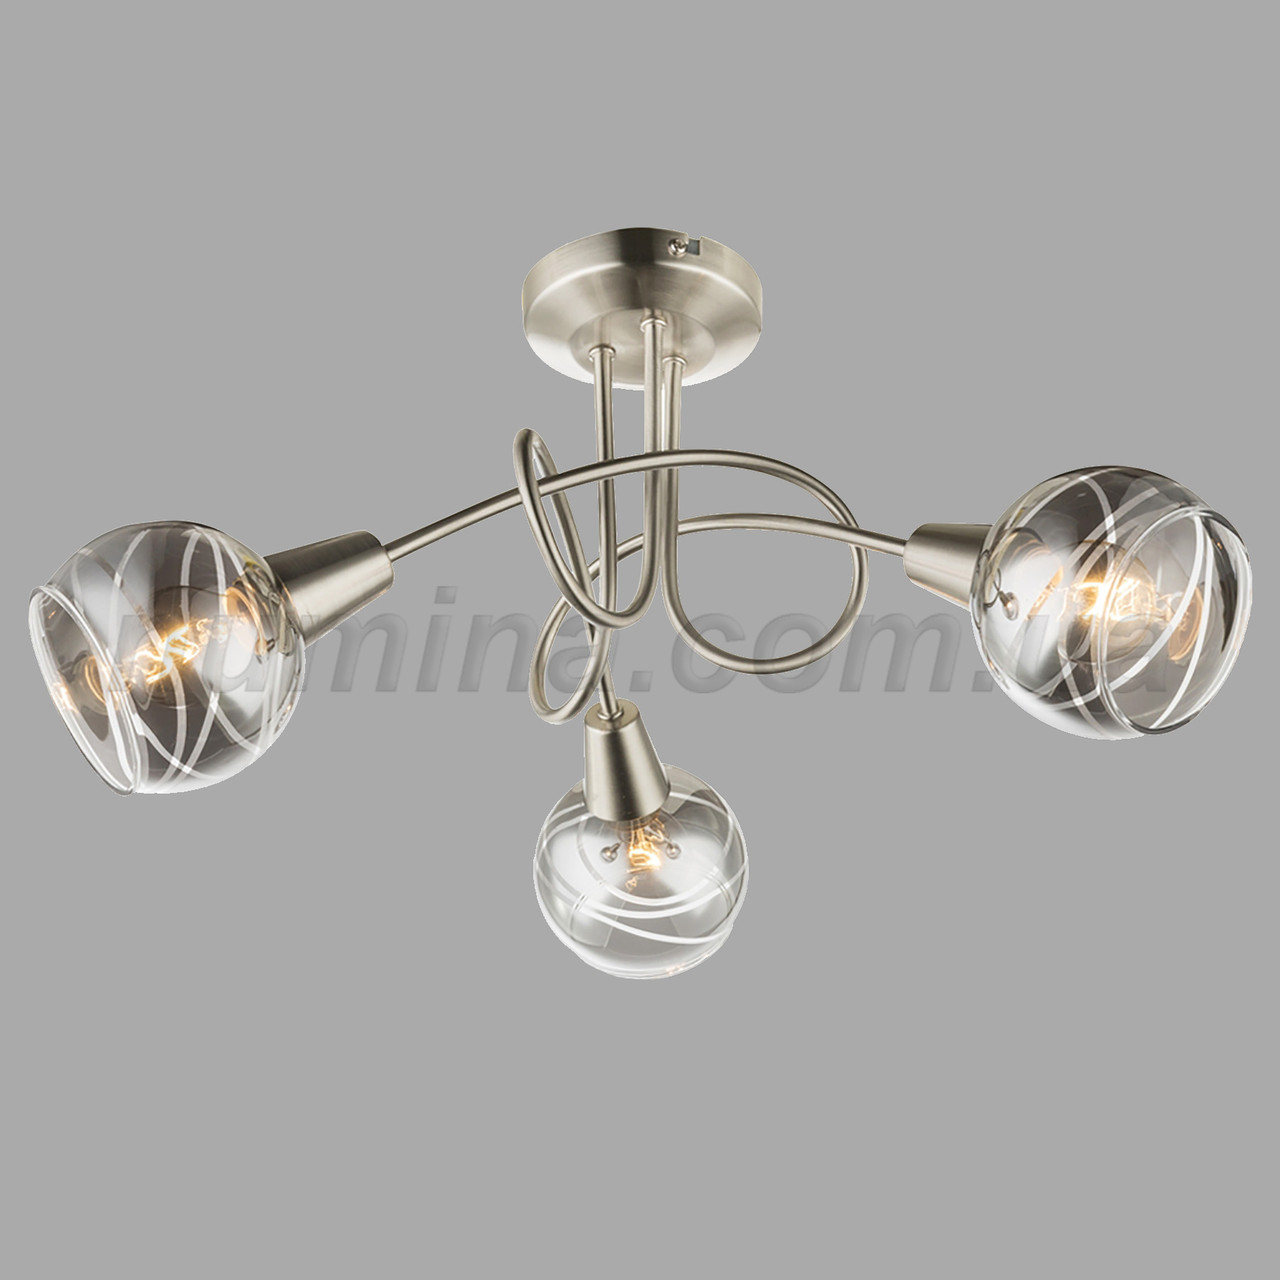 Люстра потолочная на три лампы 29-3179/3 SN+BR